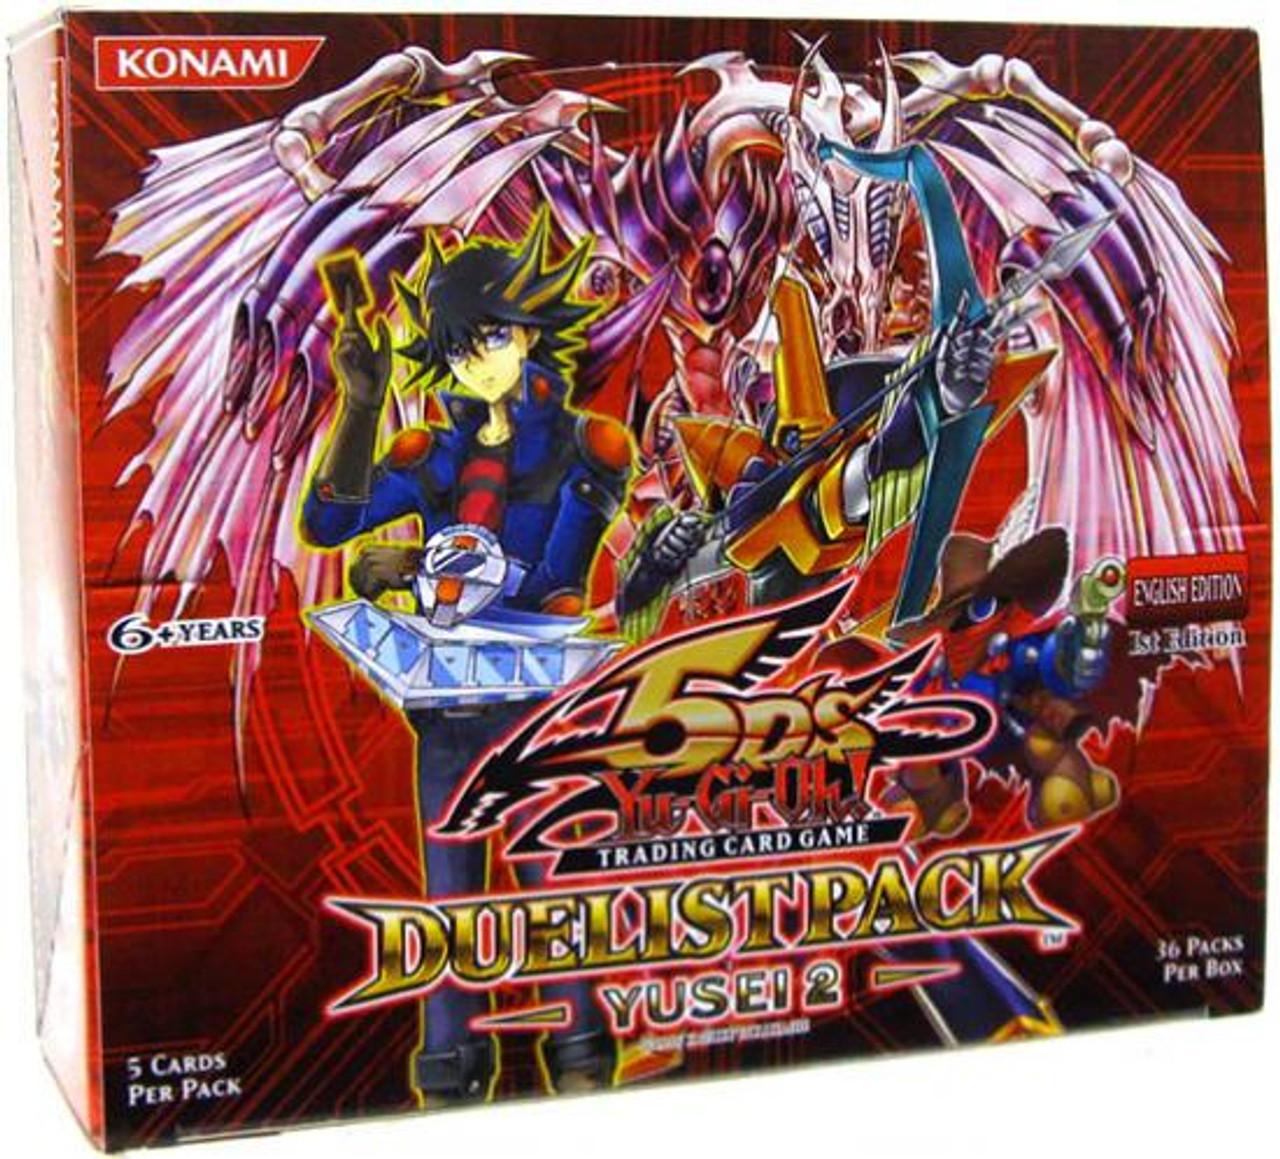 YuGiOh Duelist Pack Yusei 2 Booster Box [36 Packs] [Sealed]